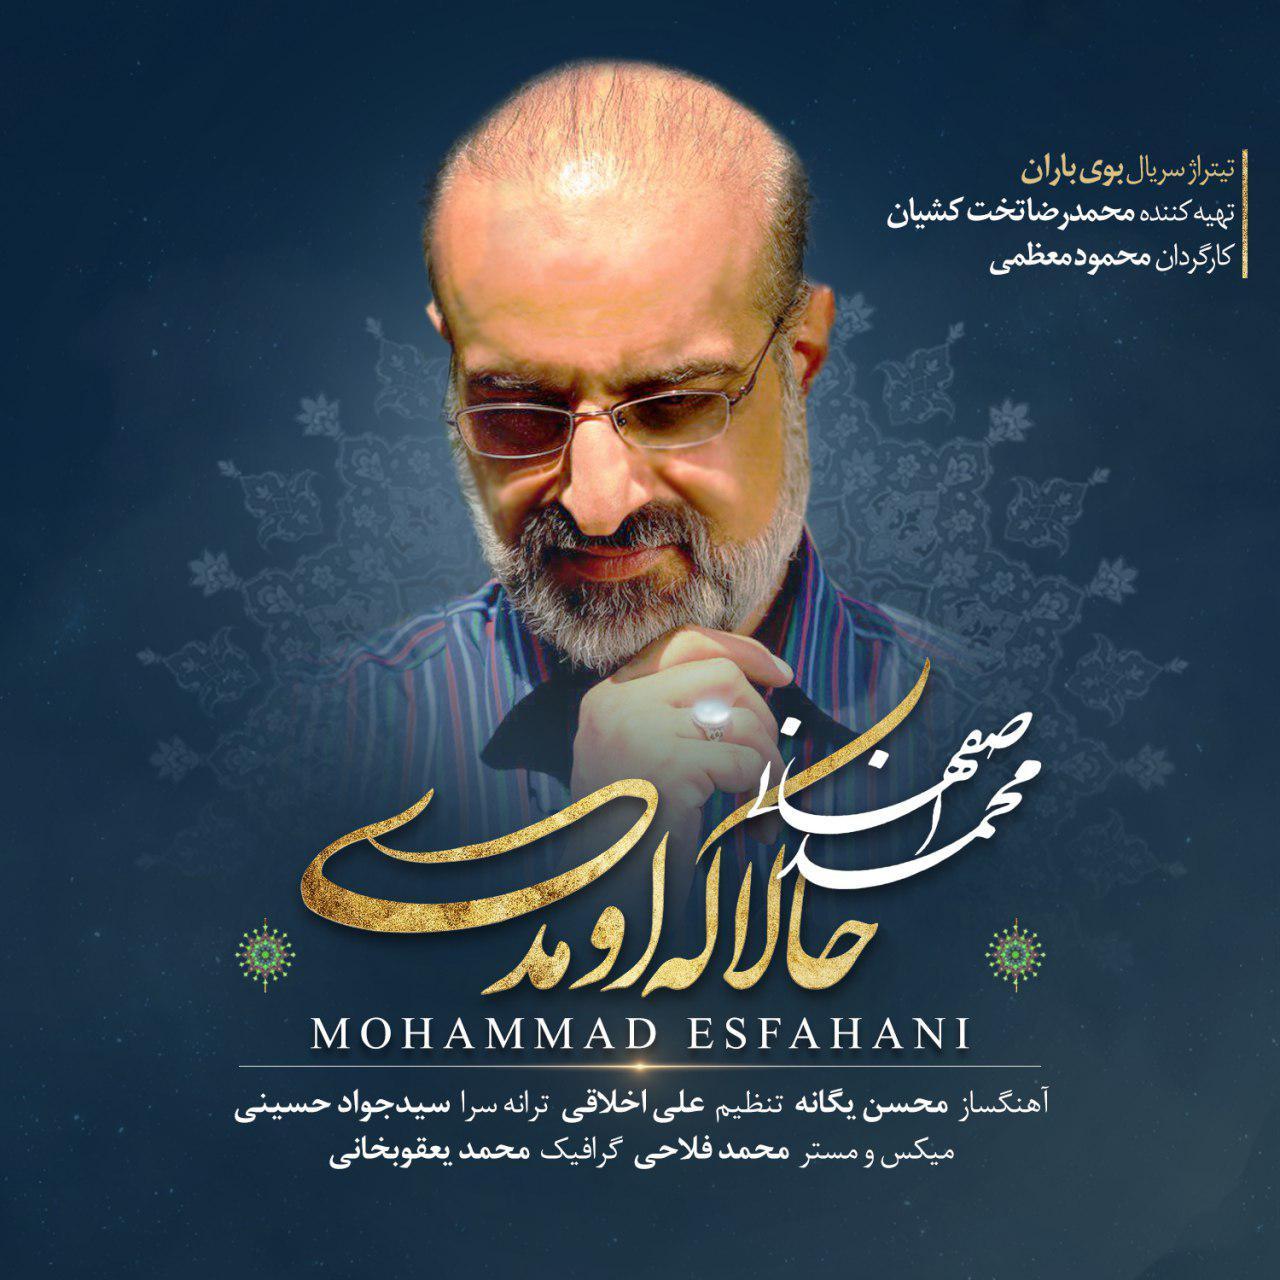 https://www.ganja2music.com/Image/Post/8.2019/Mohammad%20Esfahani%20-%20Hala%20Ke%20Omadi.jpg